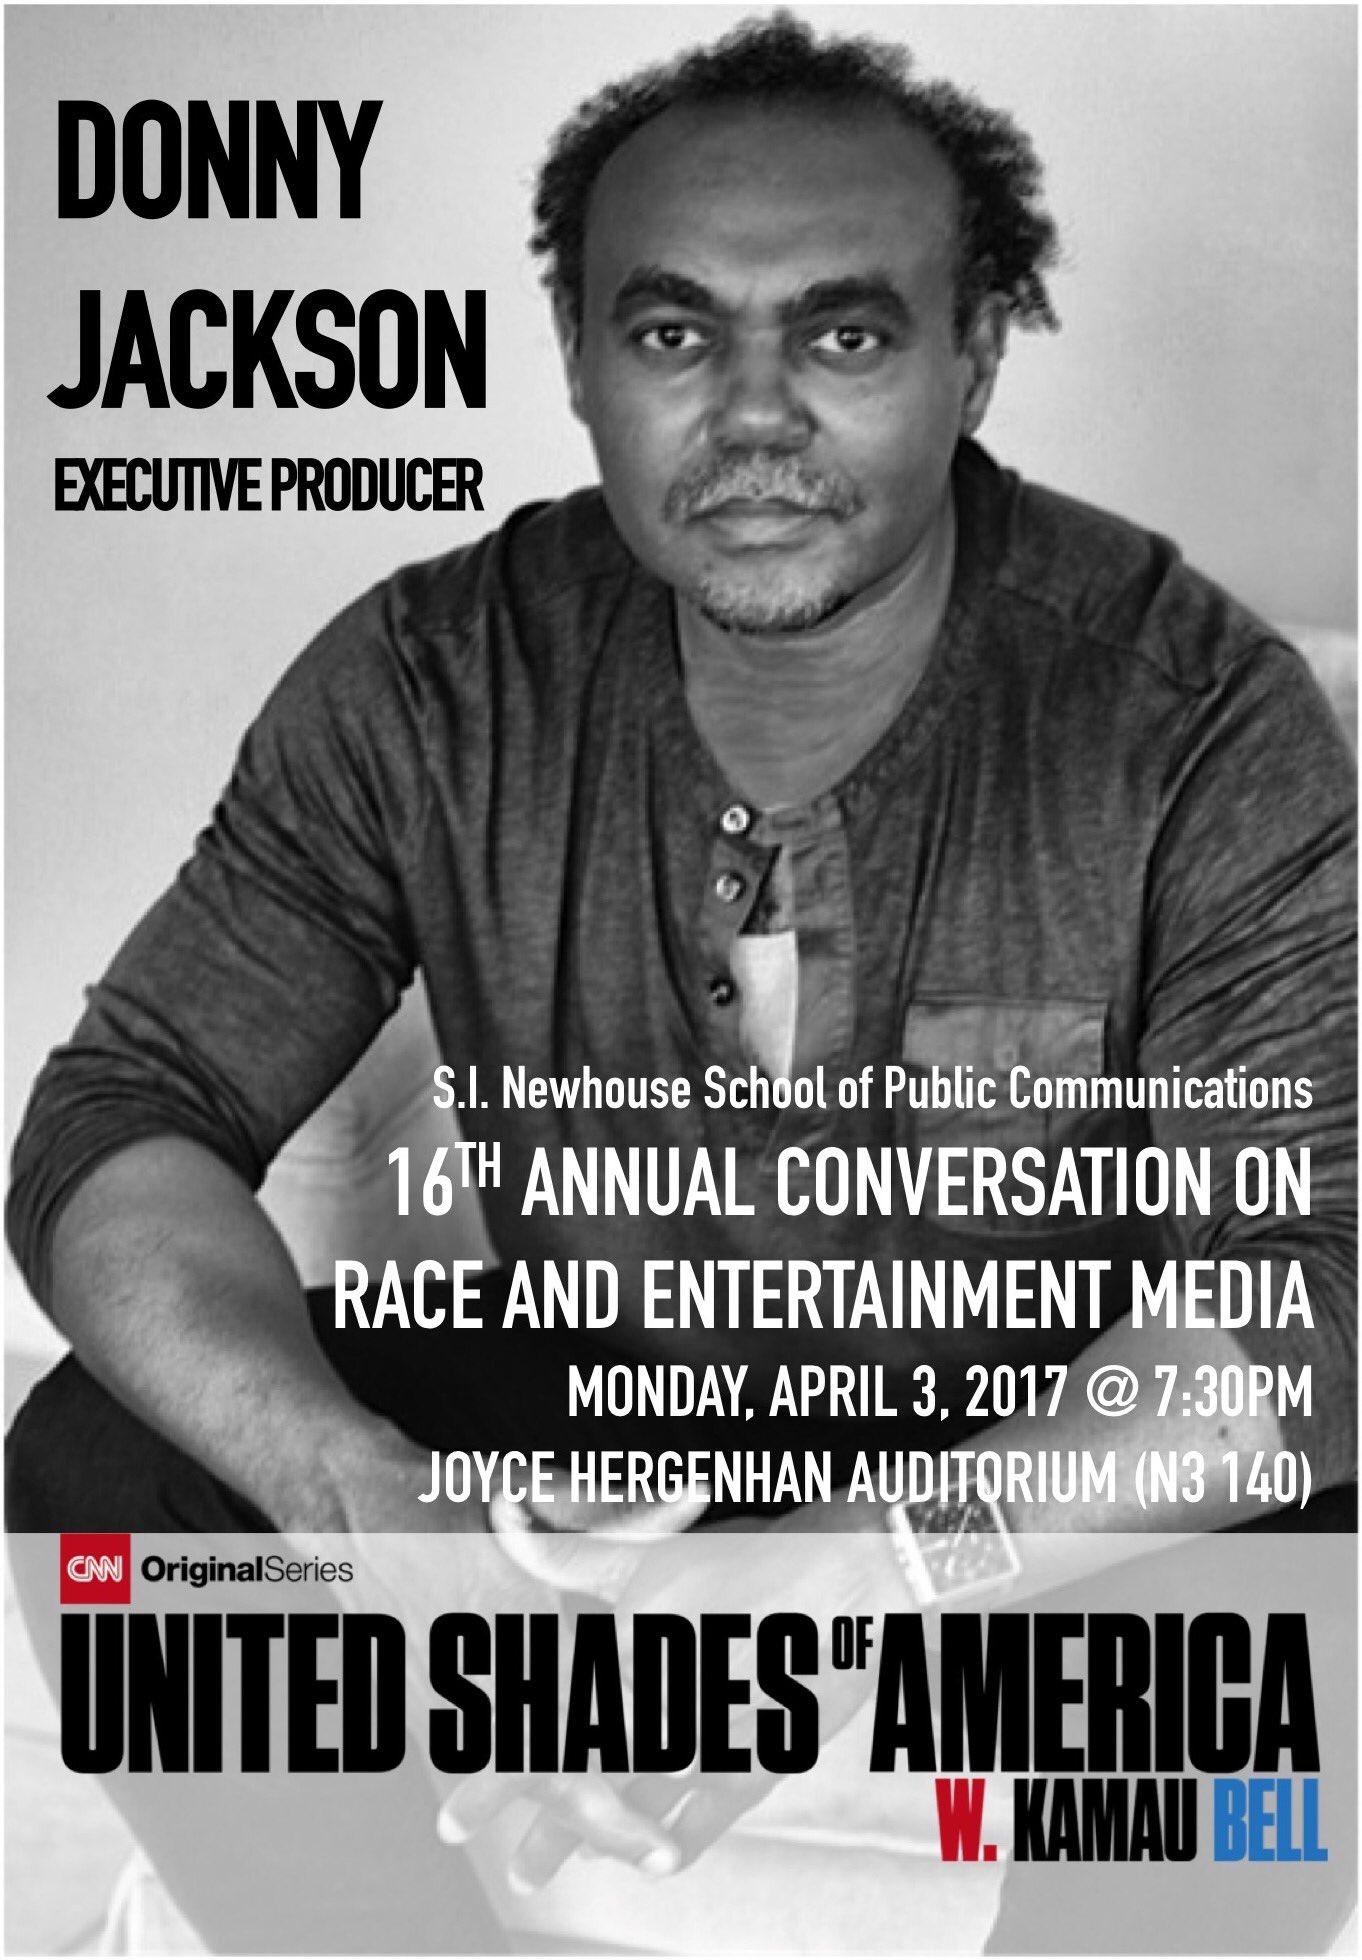 16th Annual @NewhouseSU Convo on Race & #EntertainmentMedia w/ Donny Jackson Exec Prod CNN #UnitedShades of America. MON 4/3 @ 730p The Herg https://t.co/pTlcELC6AI